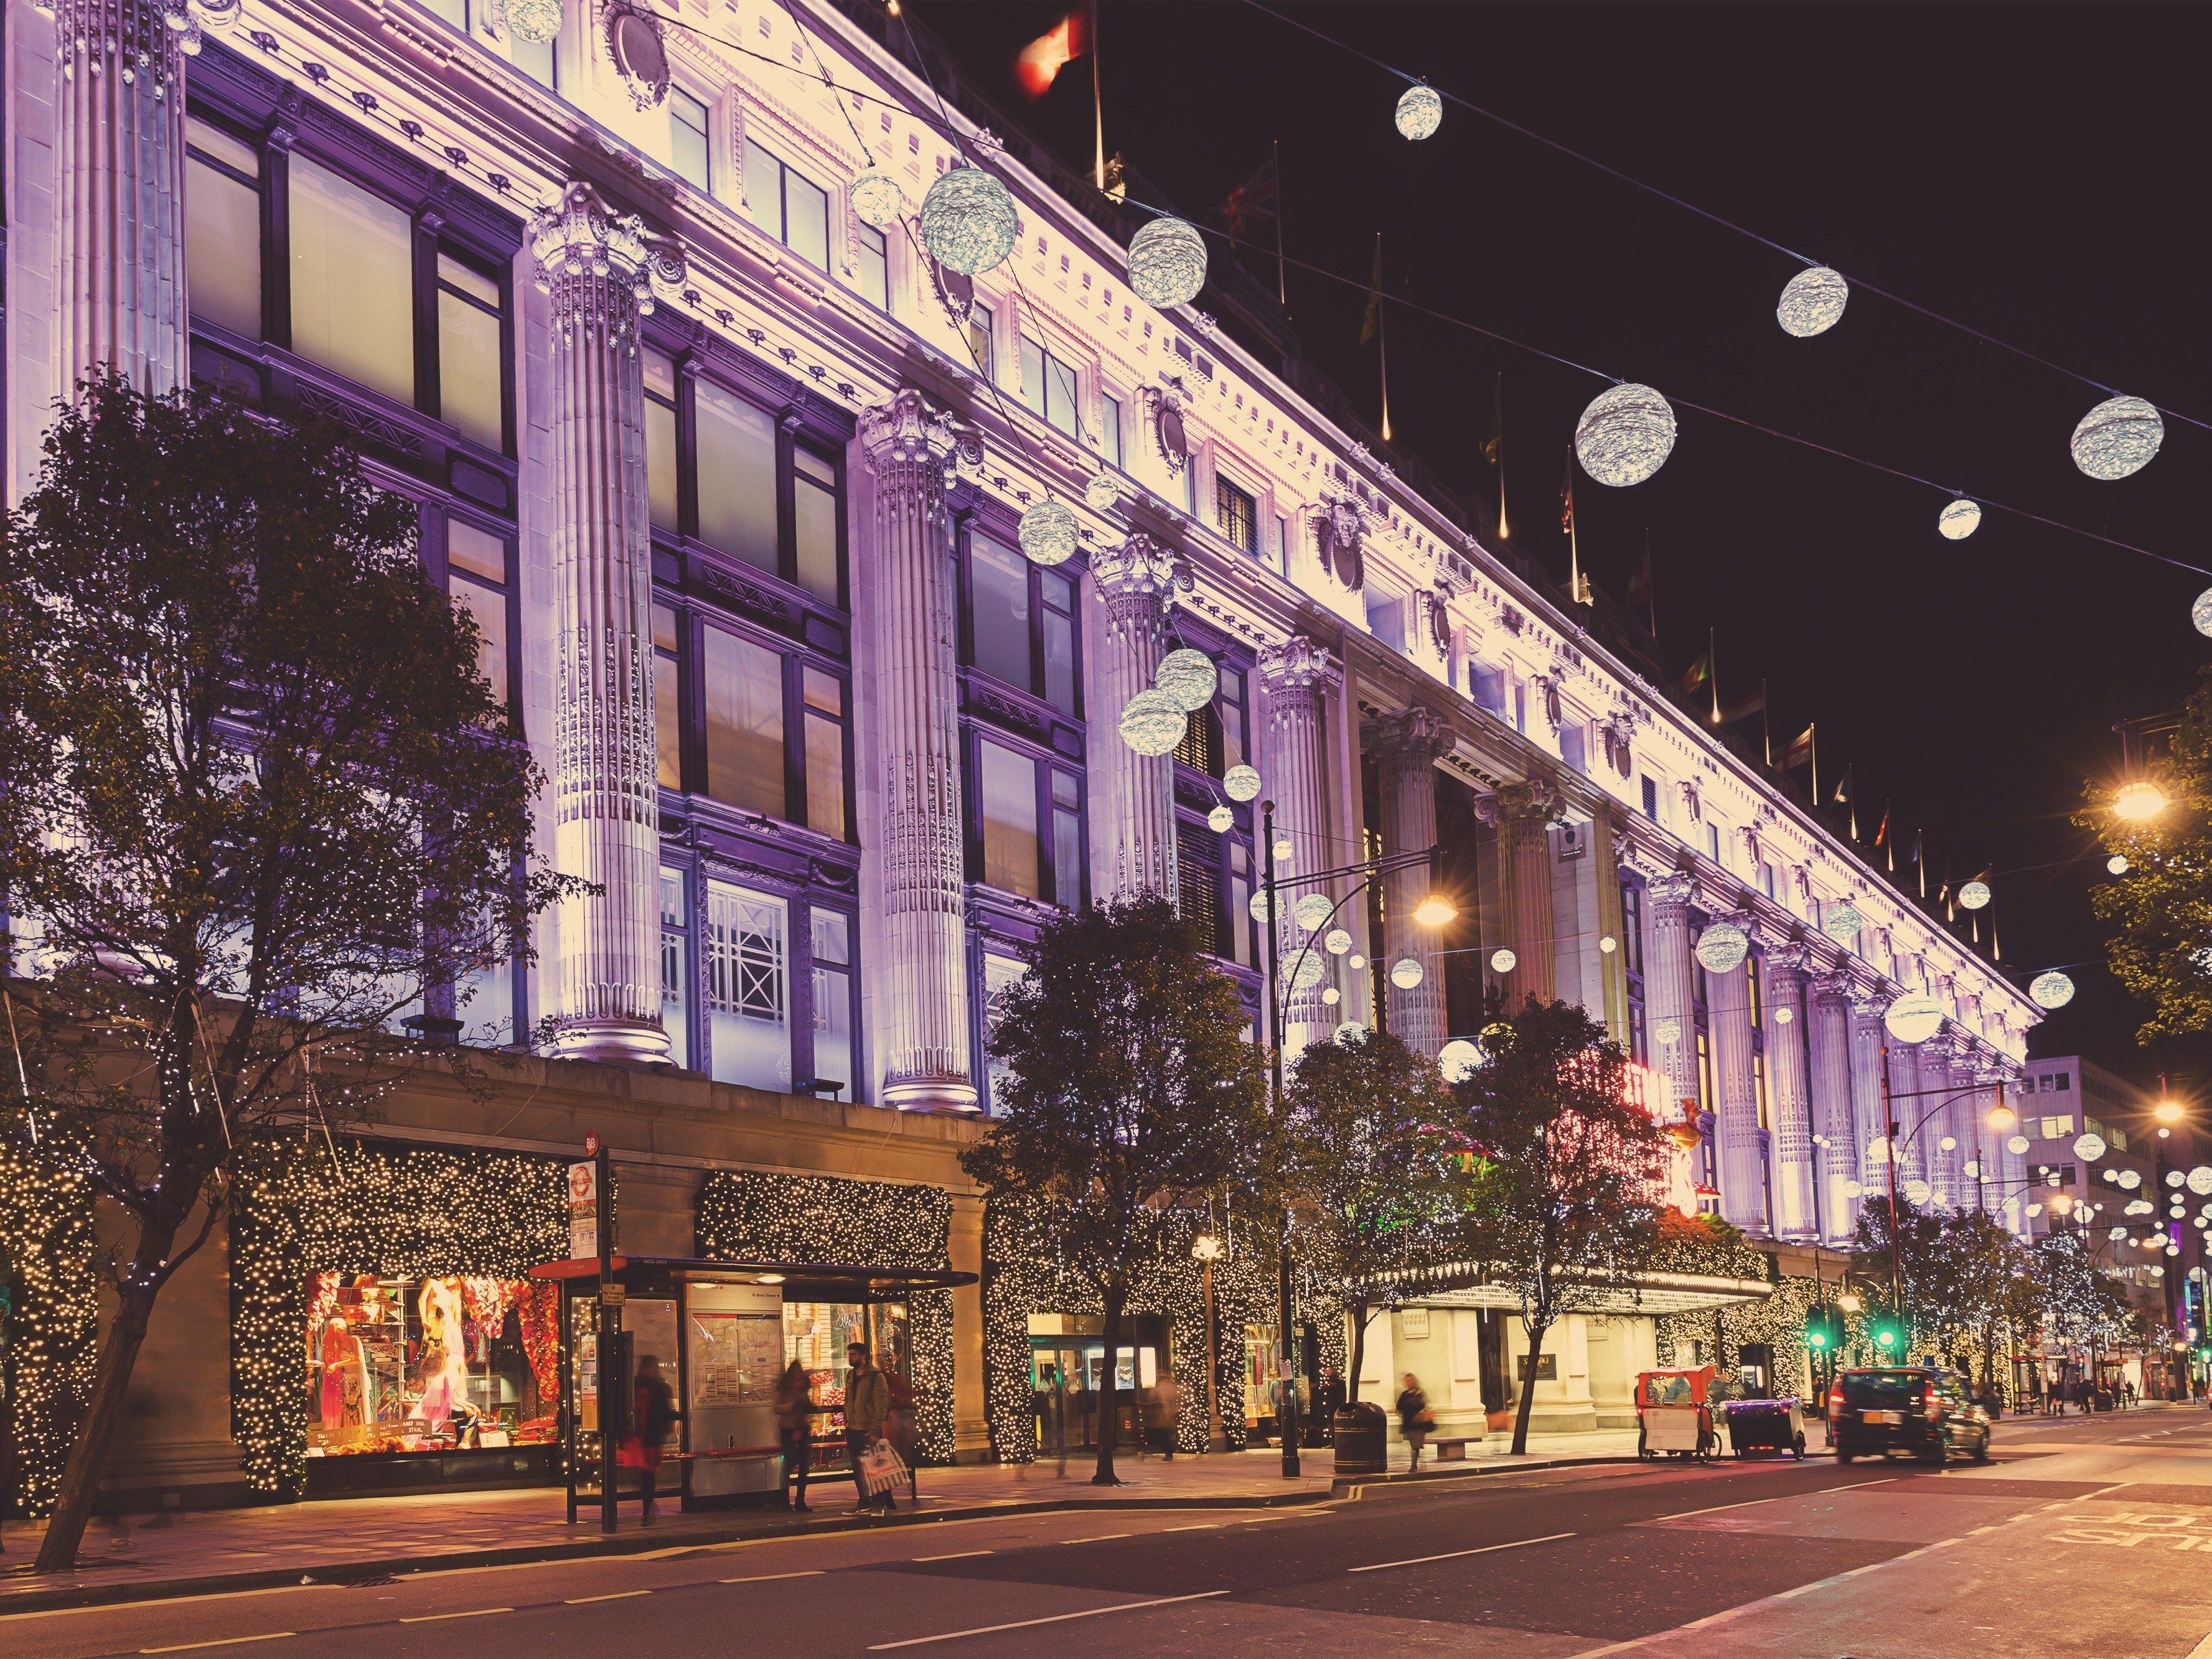 50. Oxford Street